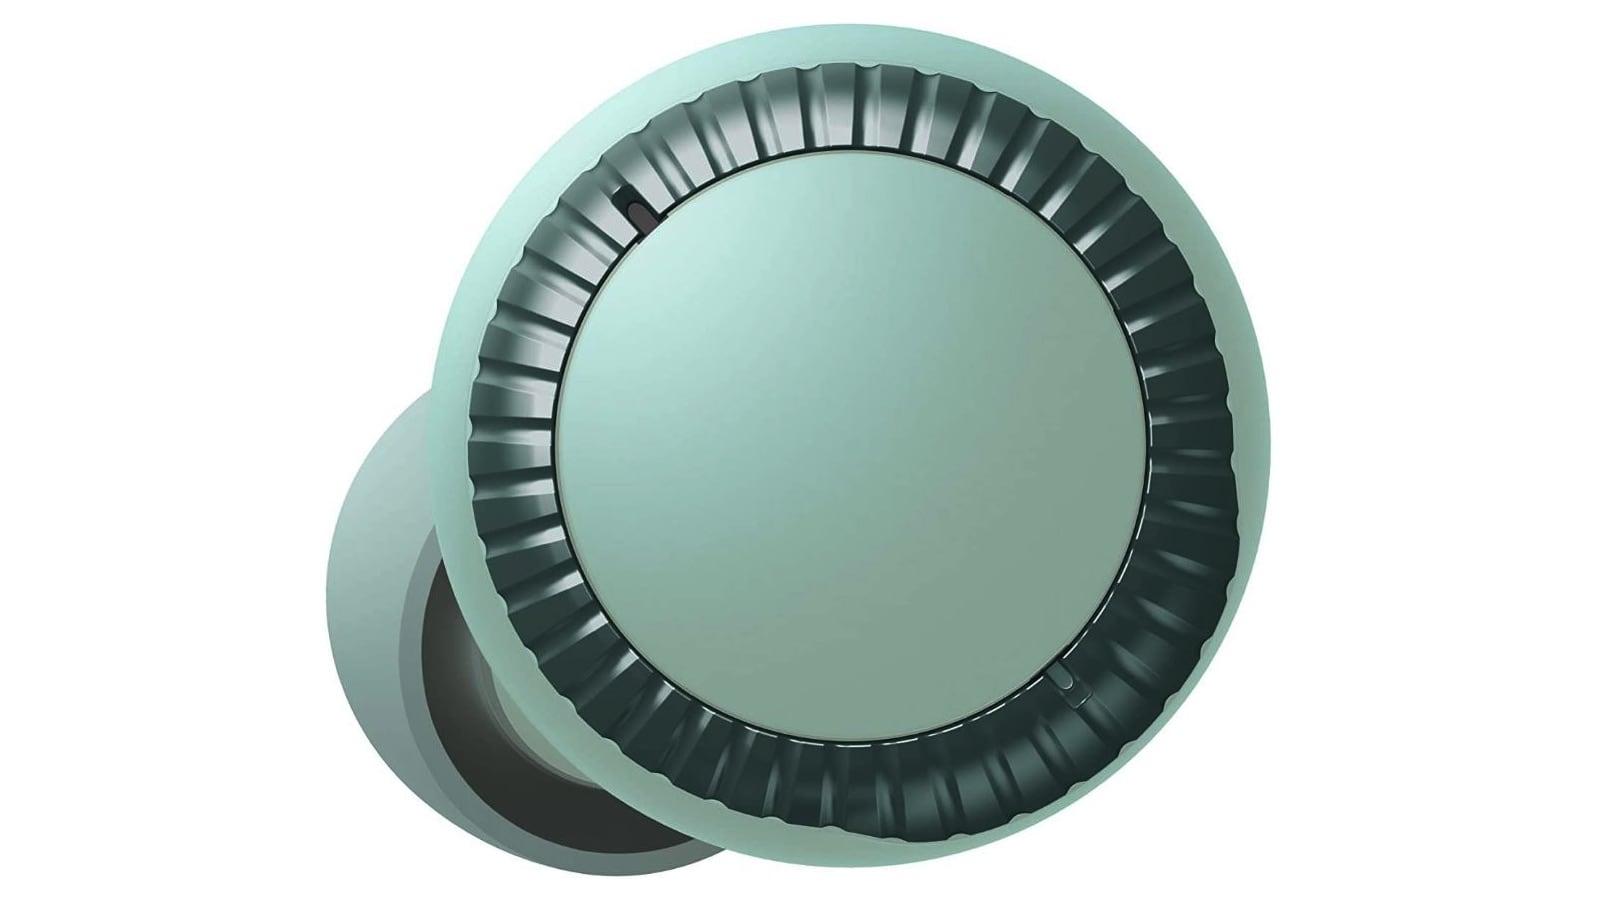 https://thegadgetflow.com/wp-content/uploads/2020/06/Panasonic-RZ-S300W-Compact-Bluetooth-Earphones-01-1200x900.jpg